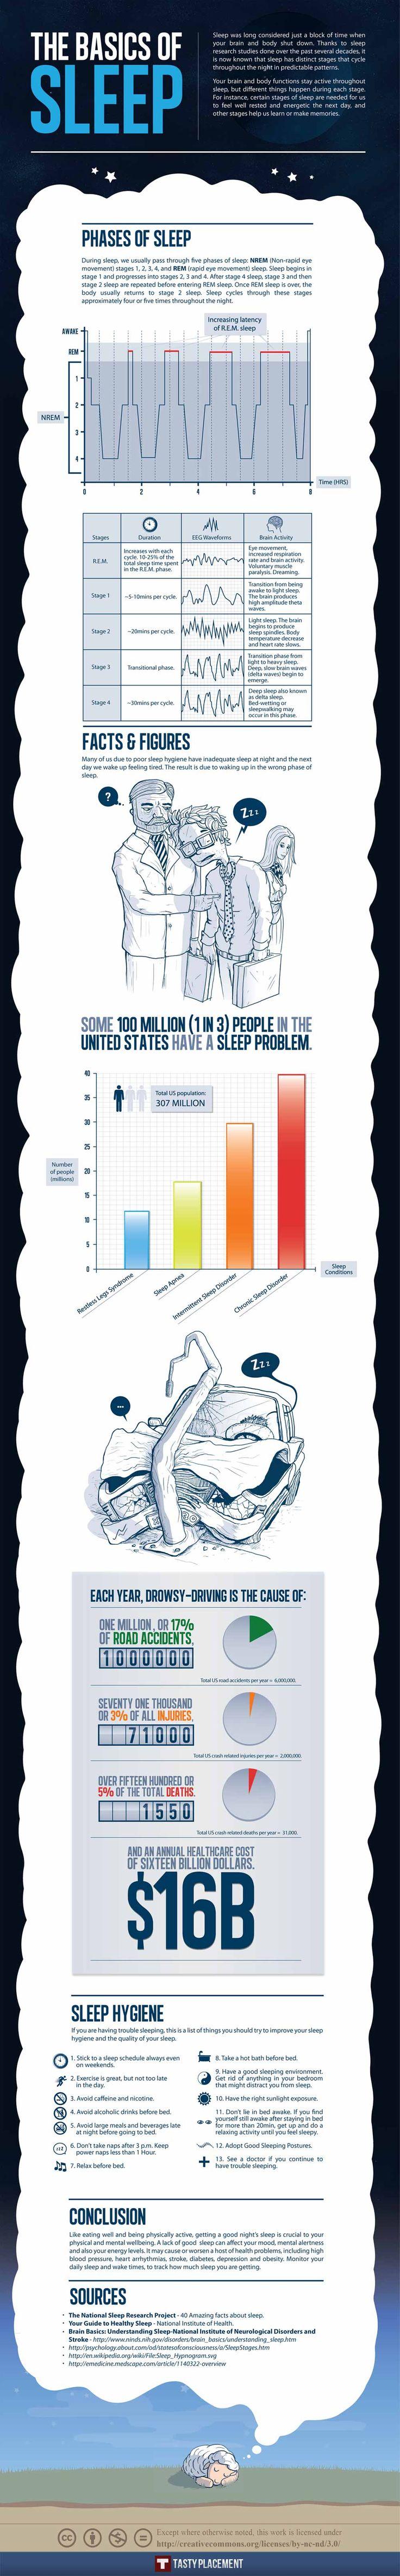 Infographic: The Basics of Sleep